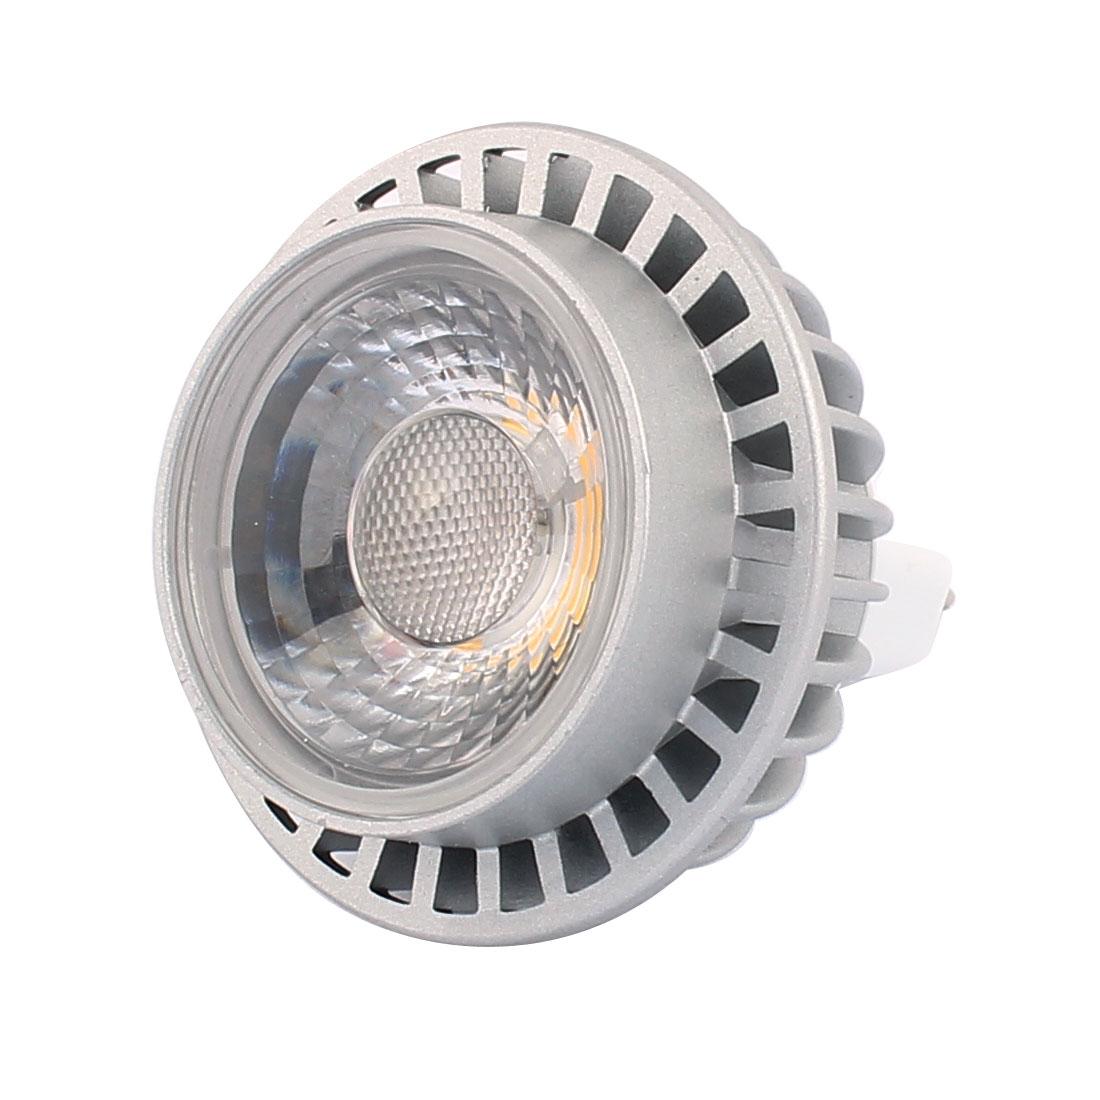 Replace DC12V 3W MR16 COB LED Spotlight Bulb Downlight Energy Saving Warm White